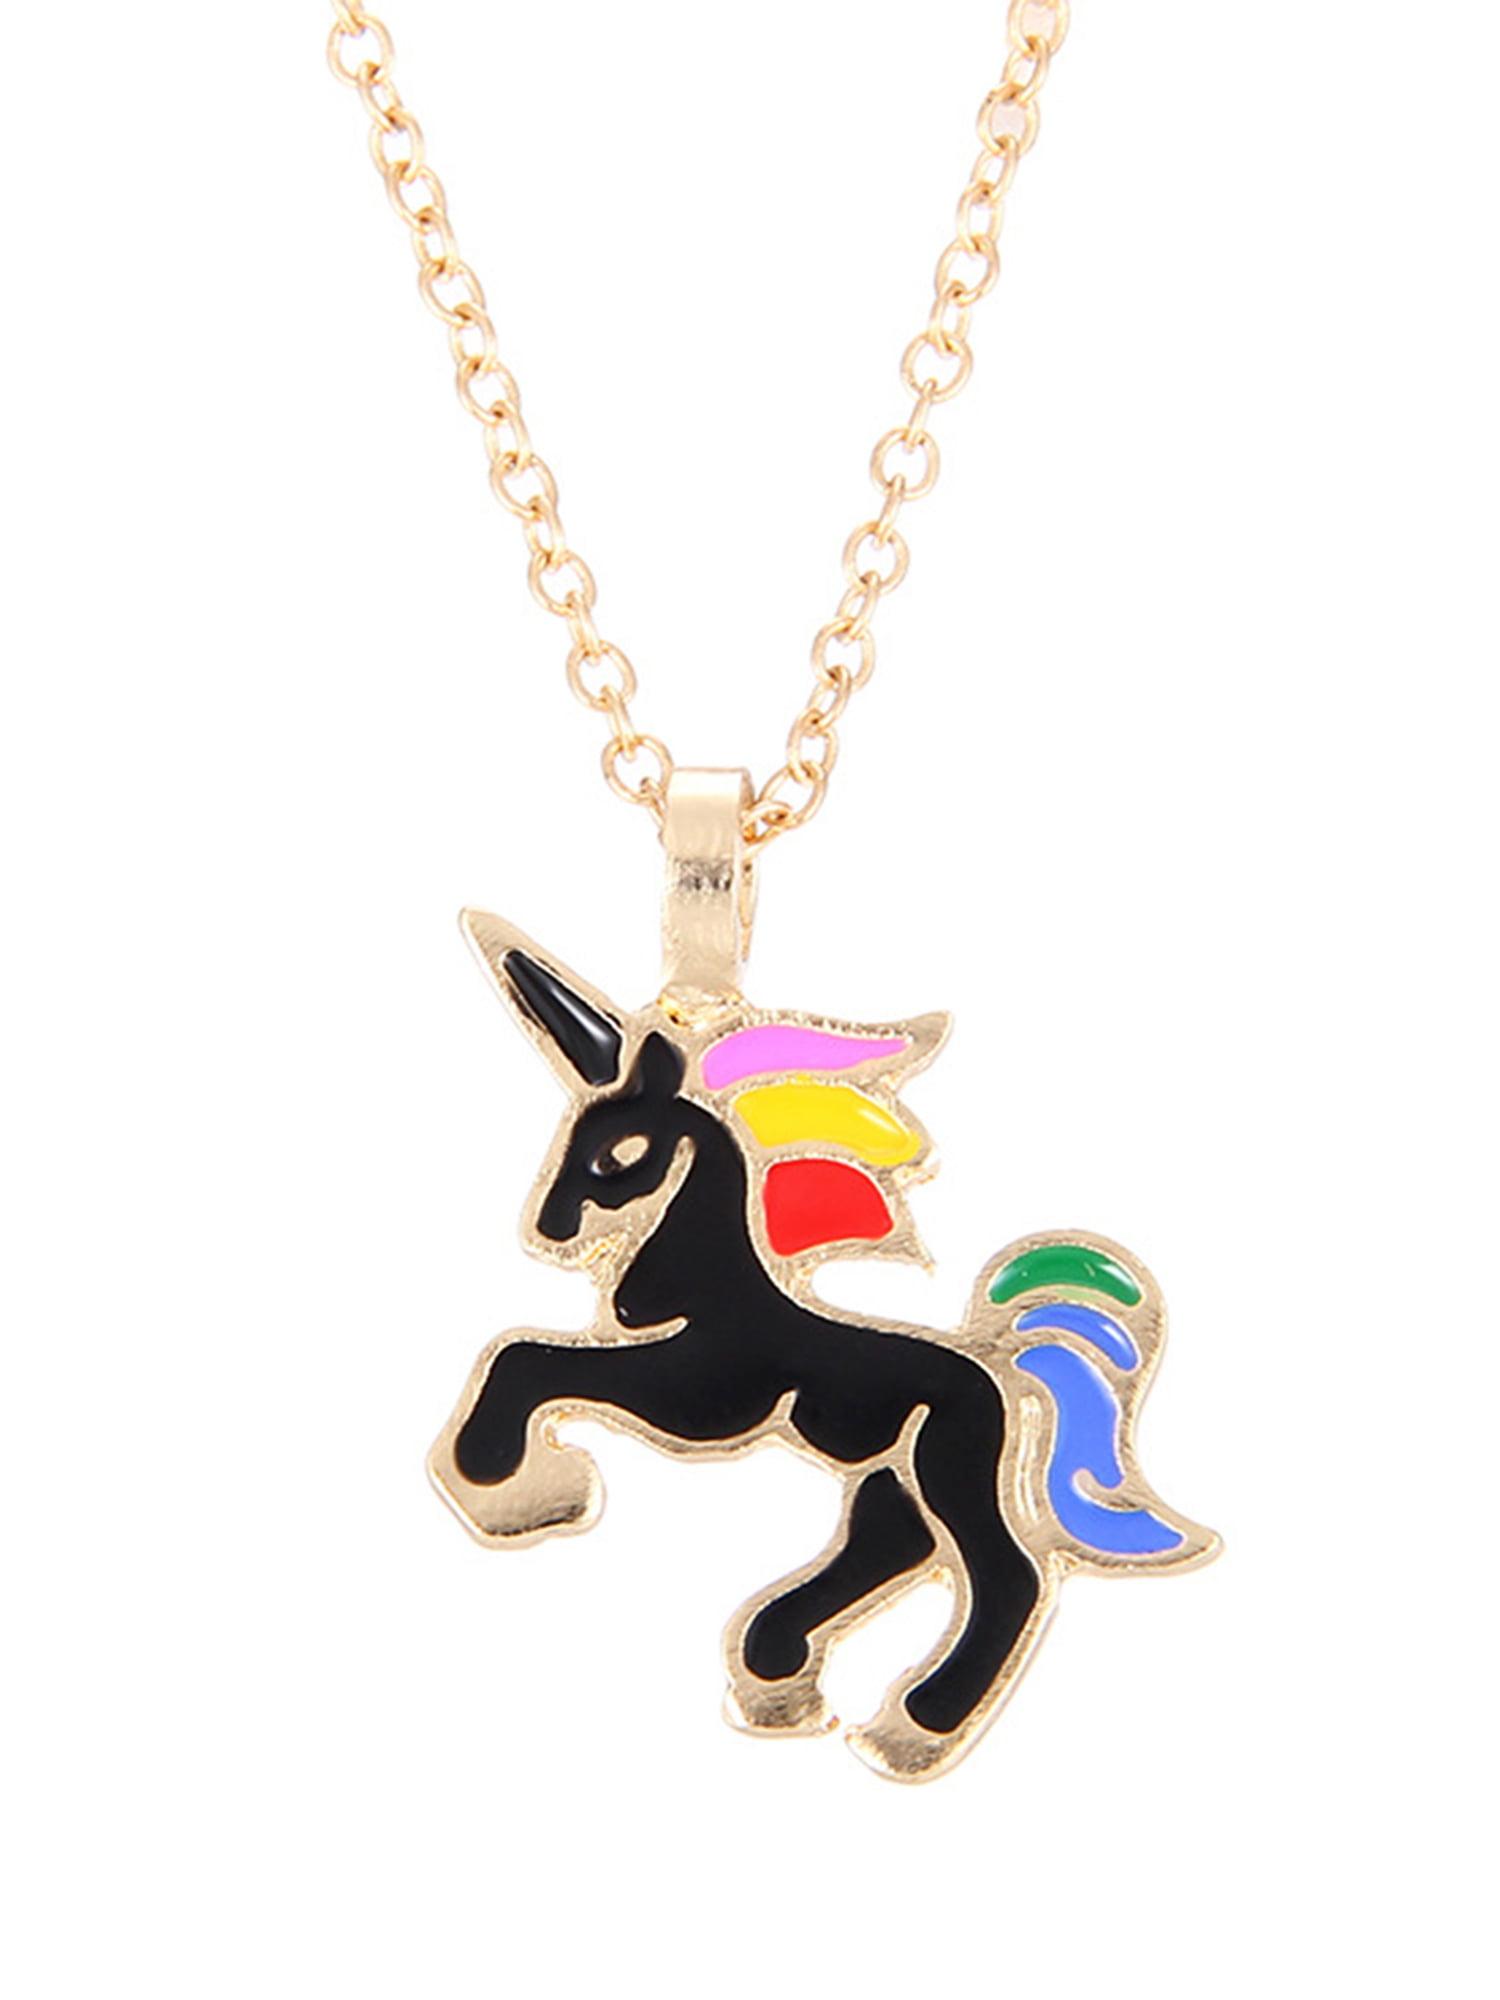 Enamal Unicorn Necklace Lovely Pendant Charm Chain Jewellery Girl for Sweater 1x